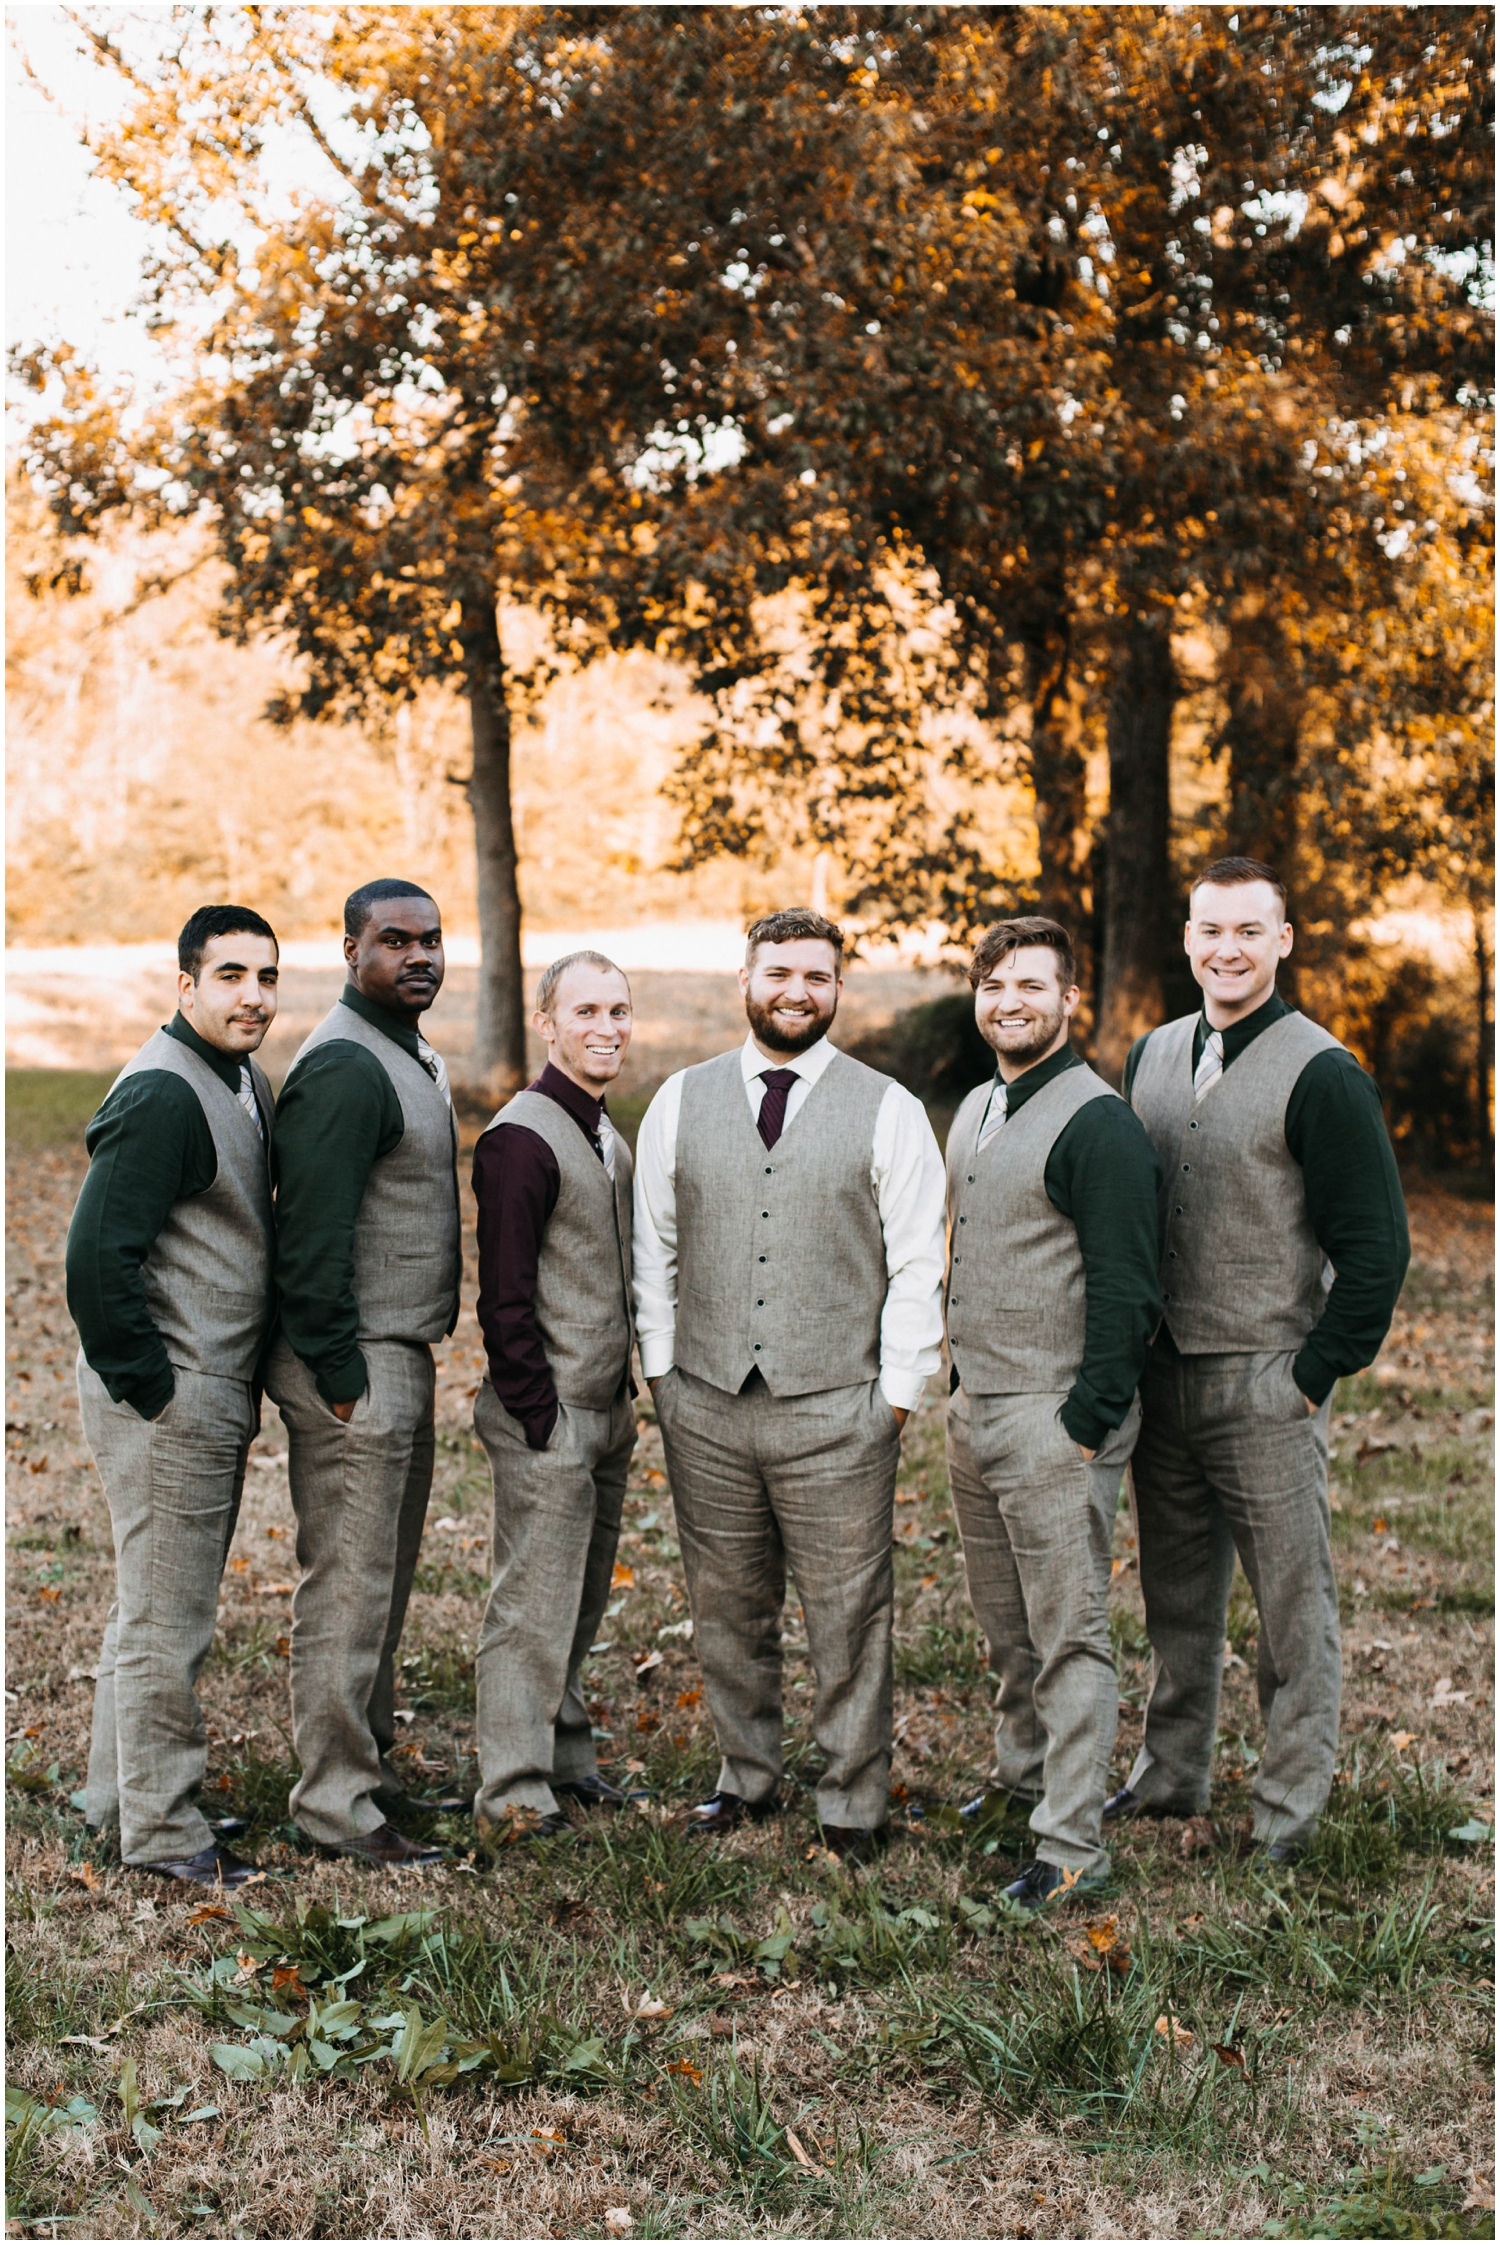 Jess+Dan_rustic_southern_farm_fall_wedding_charlotte_north carolina_taylor powers_0128.jpg